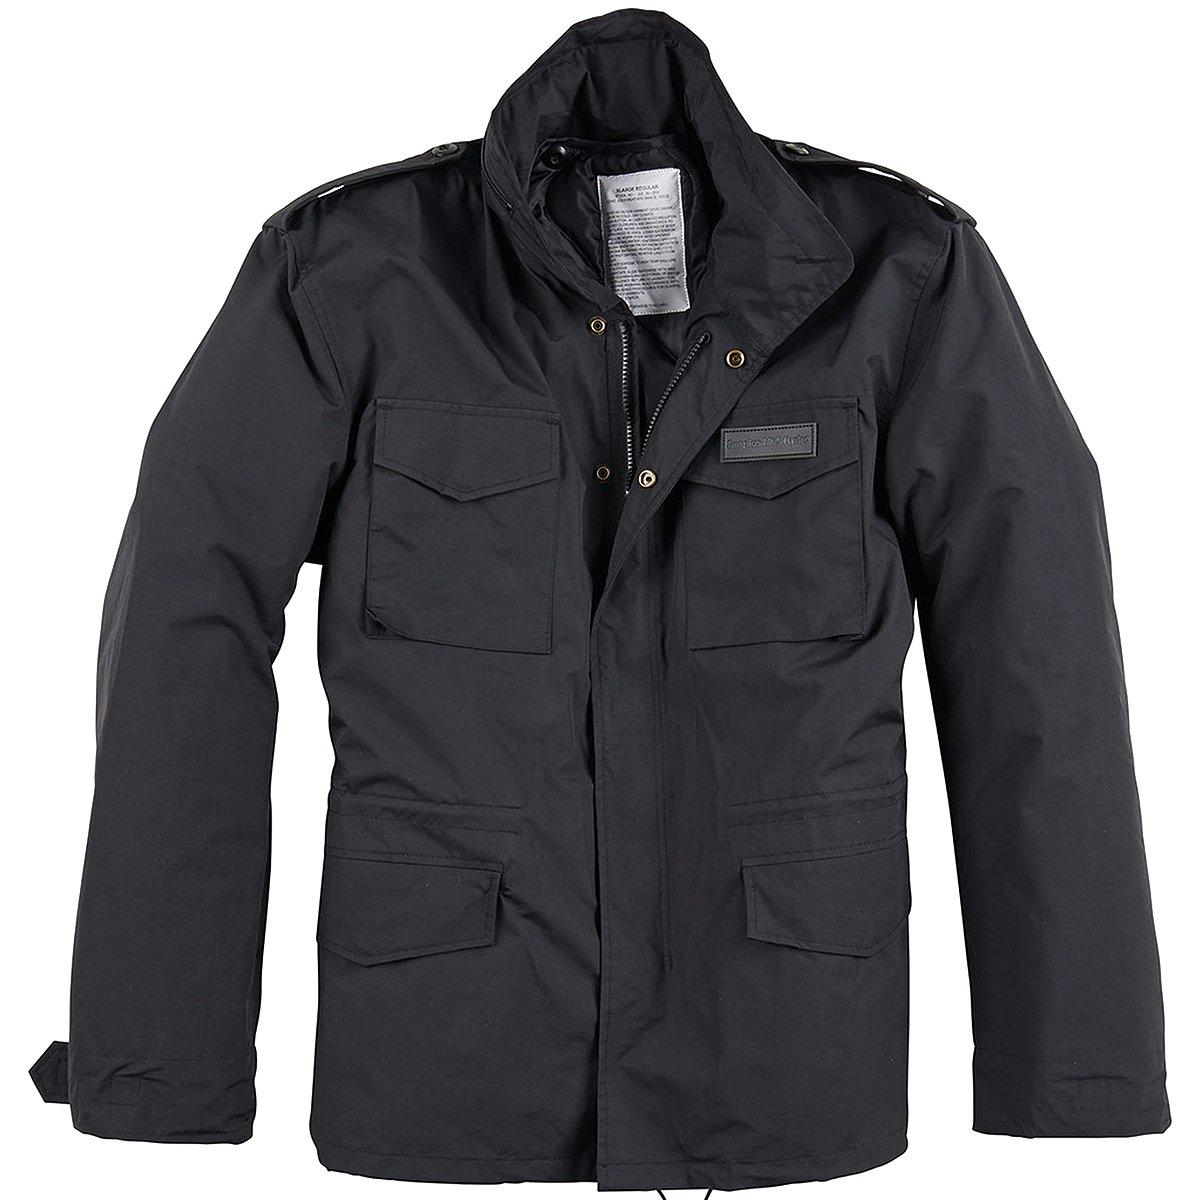 Surplus M65 Hydro US Field Jacket Black Size XL